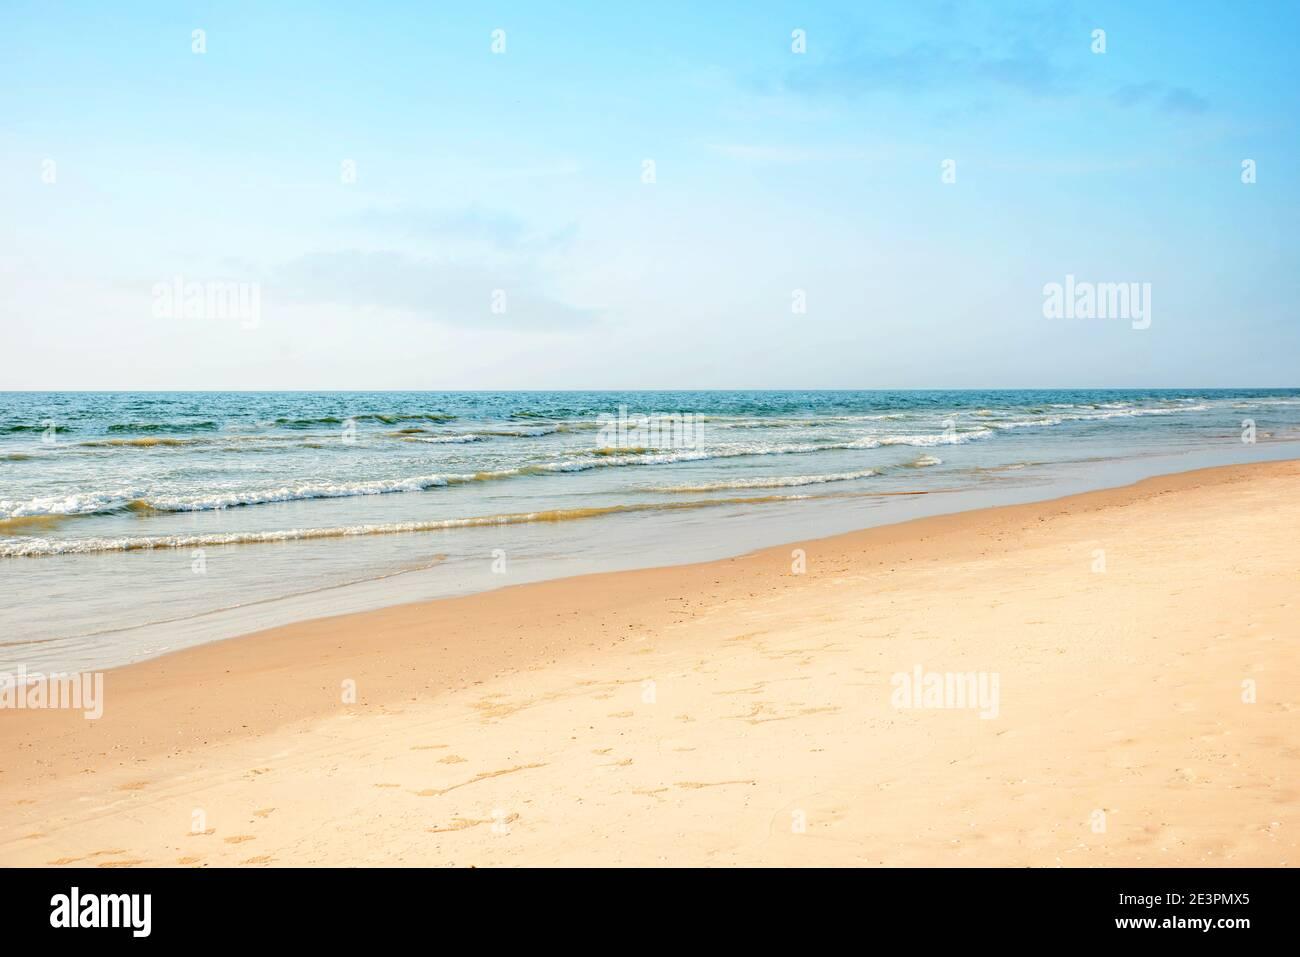 Playa limpia y paisaje marino tropical Foto de stock